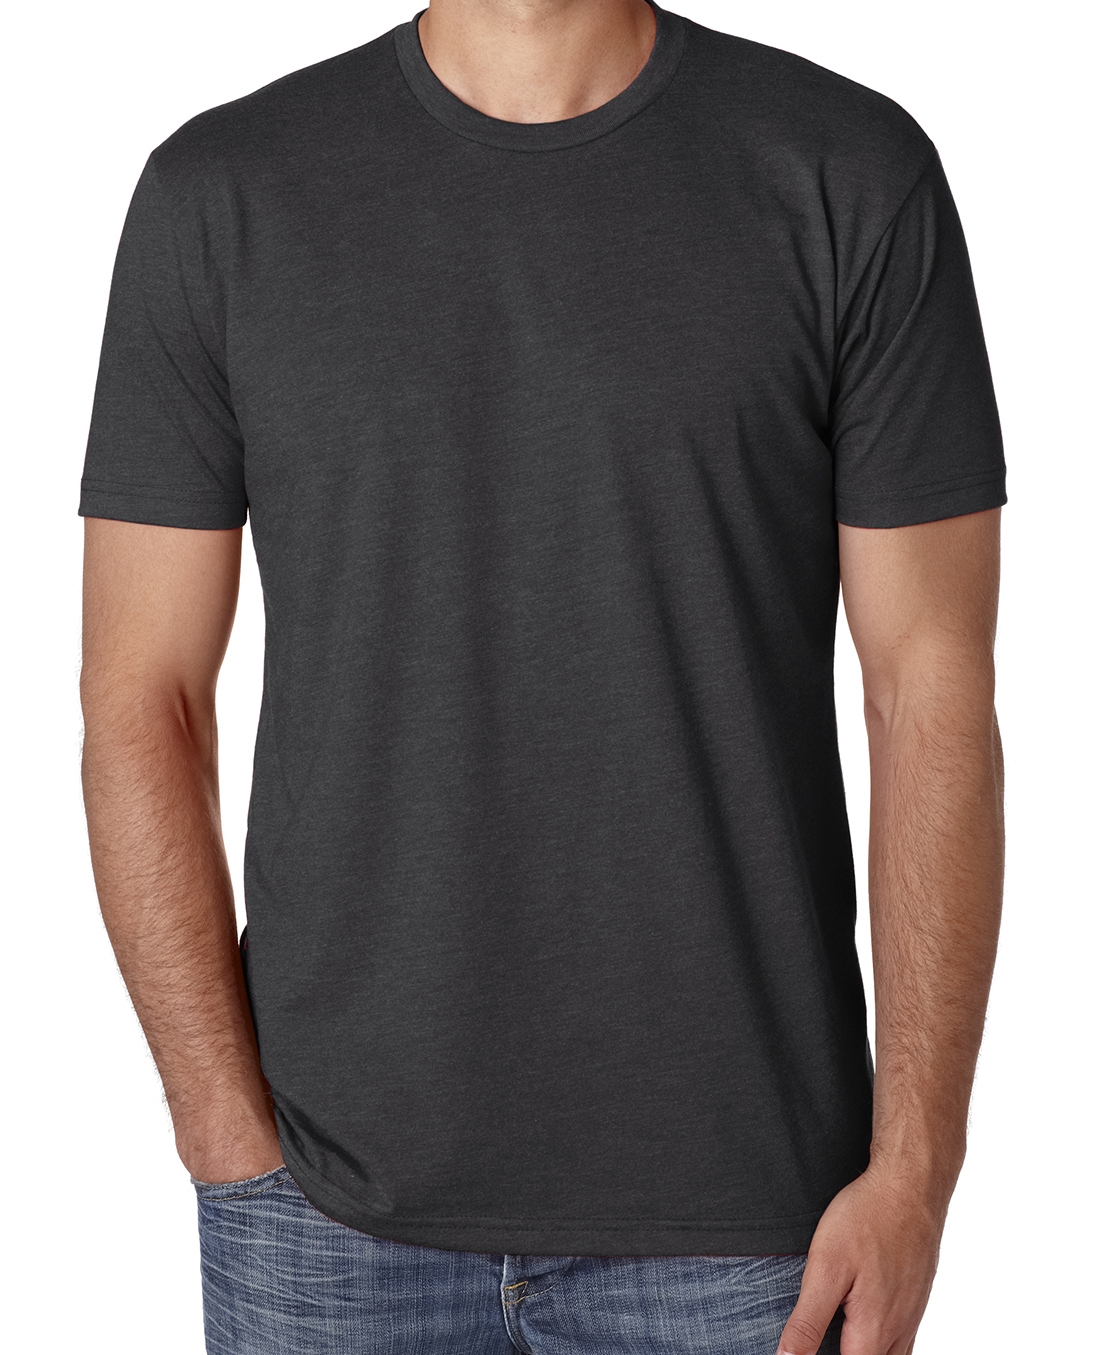 Unisex CVC crew neck t-shirt (cotton polyester blend, great fit, very soft, $$).